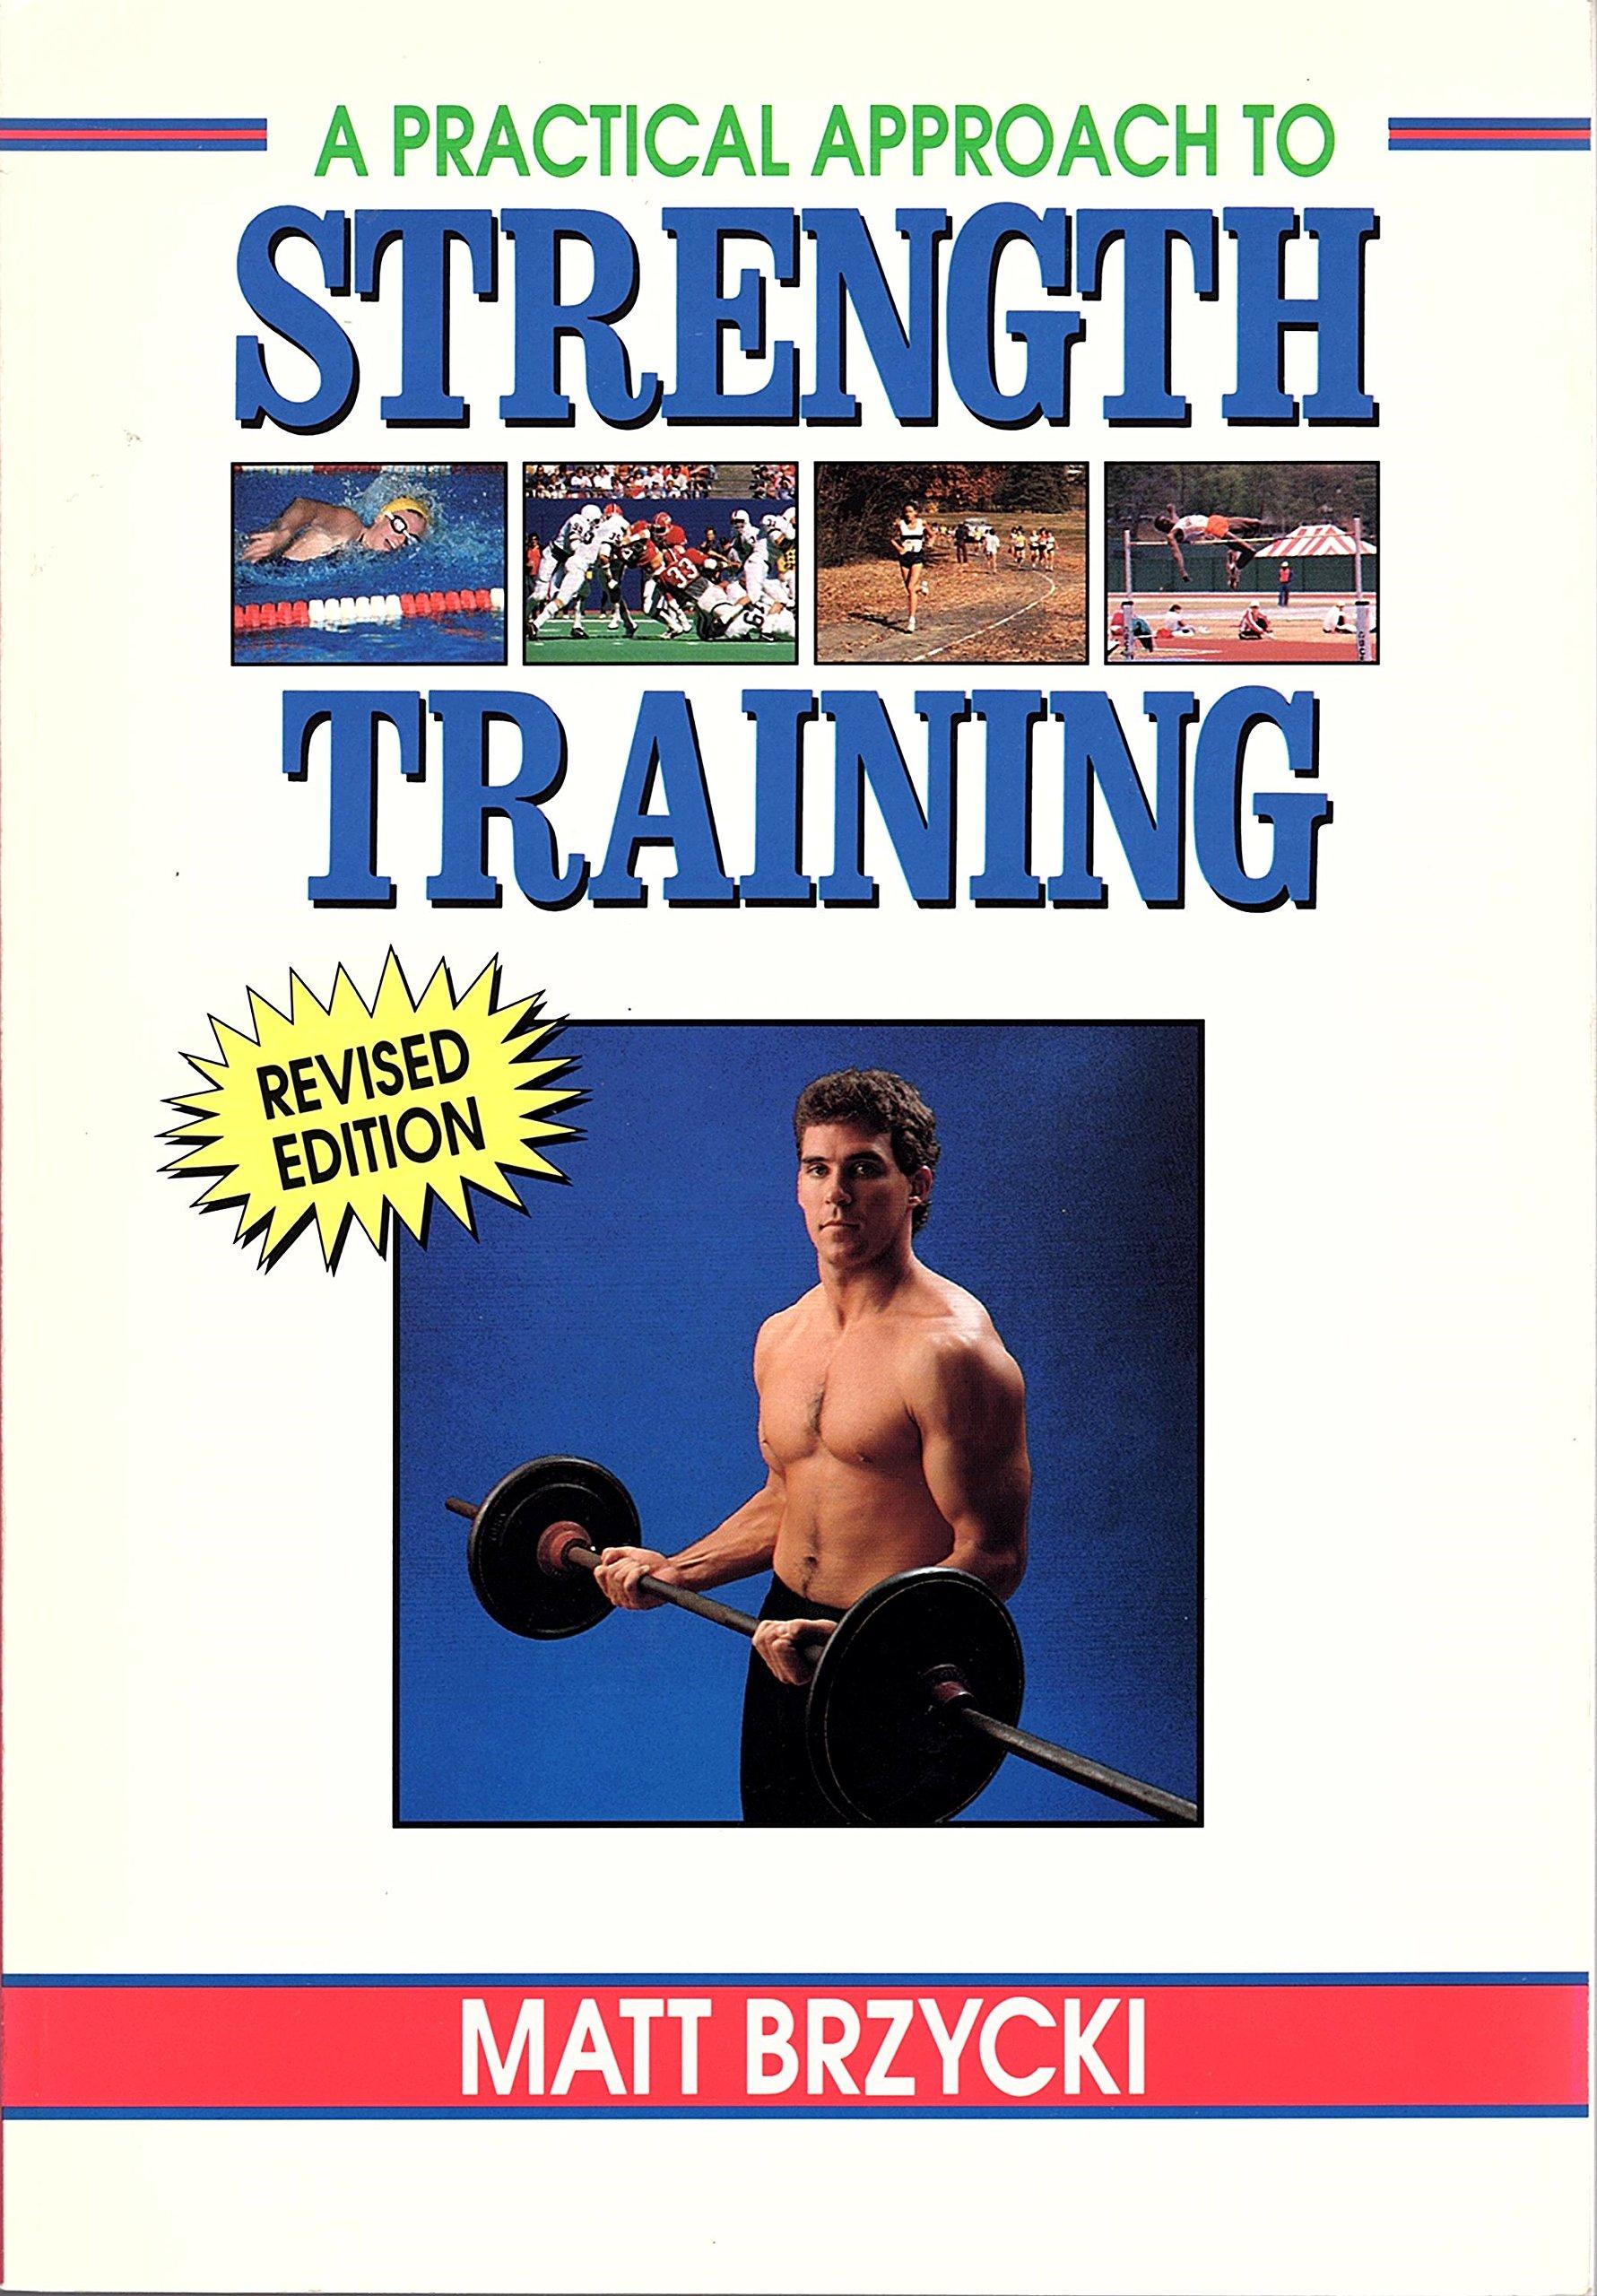 A Practical Approach to Strength Training: Matt Brzycki: 9780940279391:  Amazon.com: Books